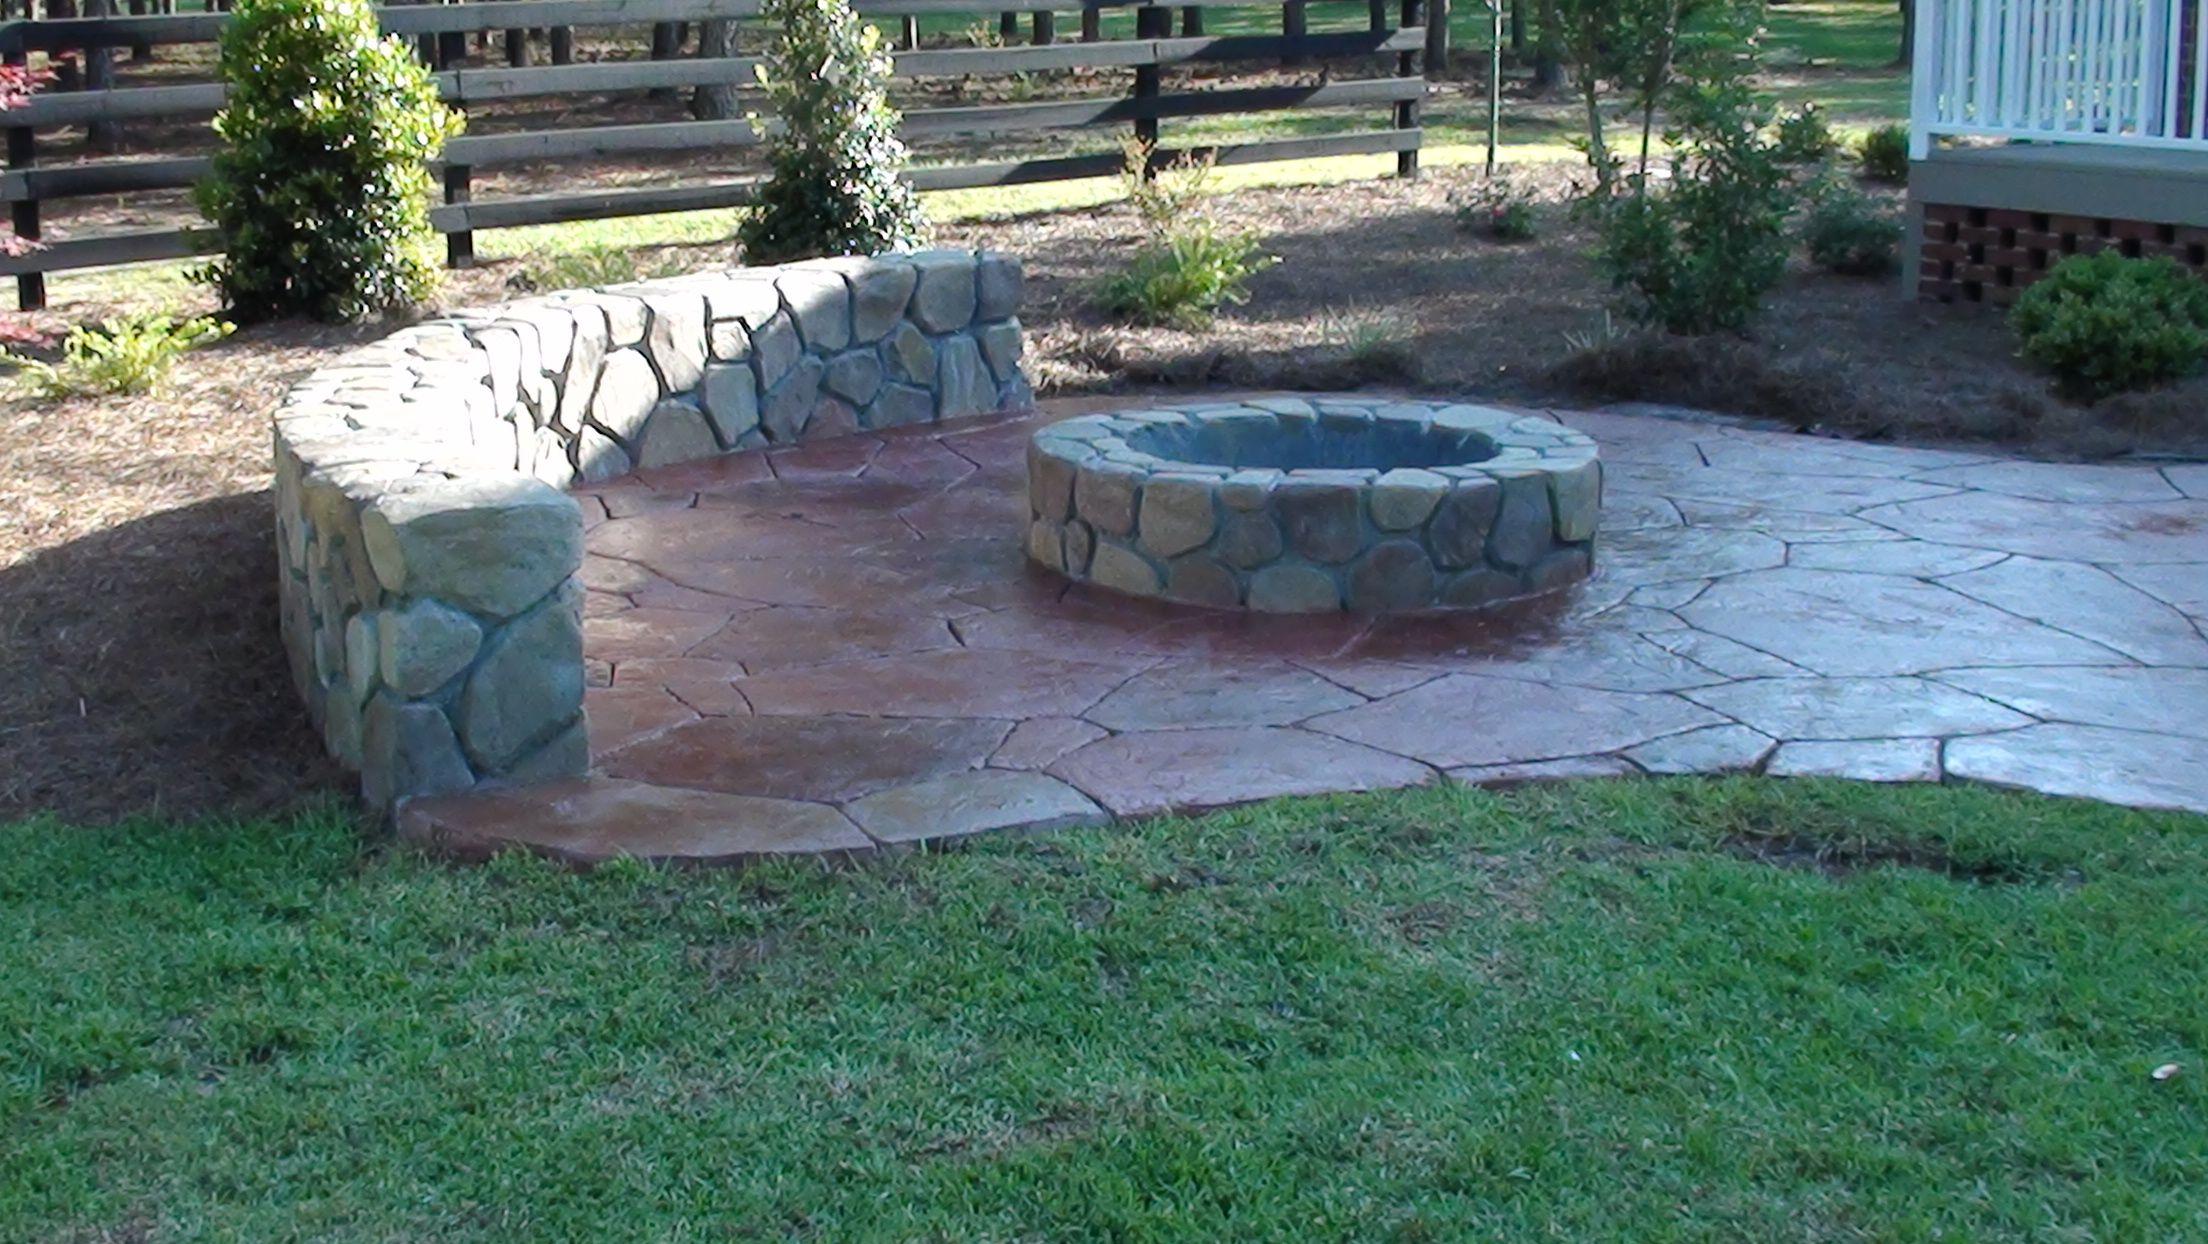 Stonemaker Fire Pit Seatwall Jpg 2 208 1 244 Pixels Outdoor Relaxing Patio Hardscape